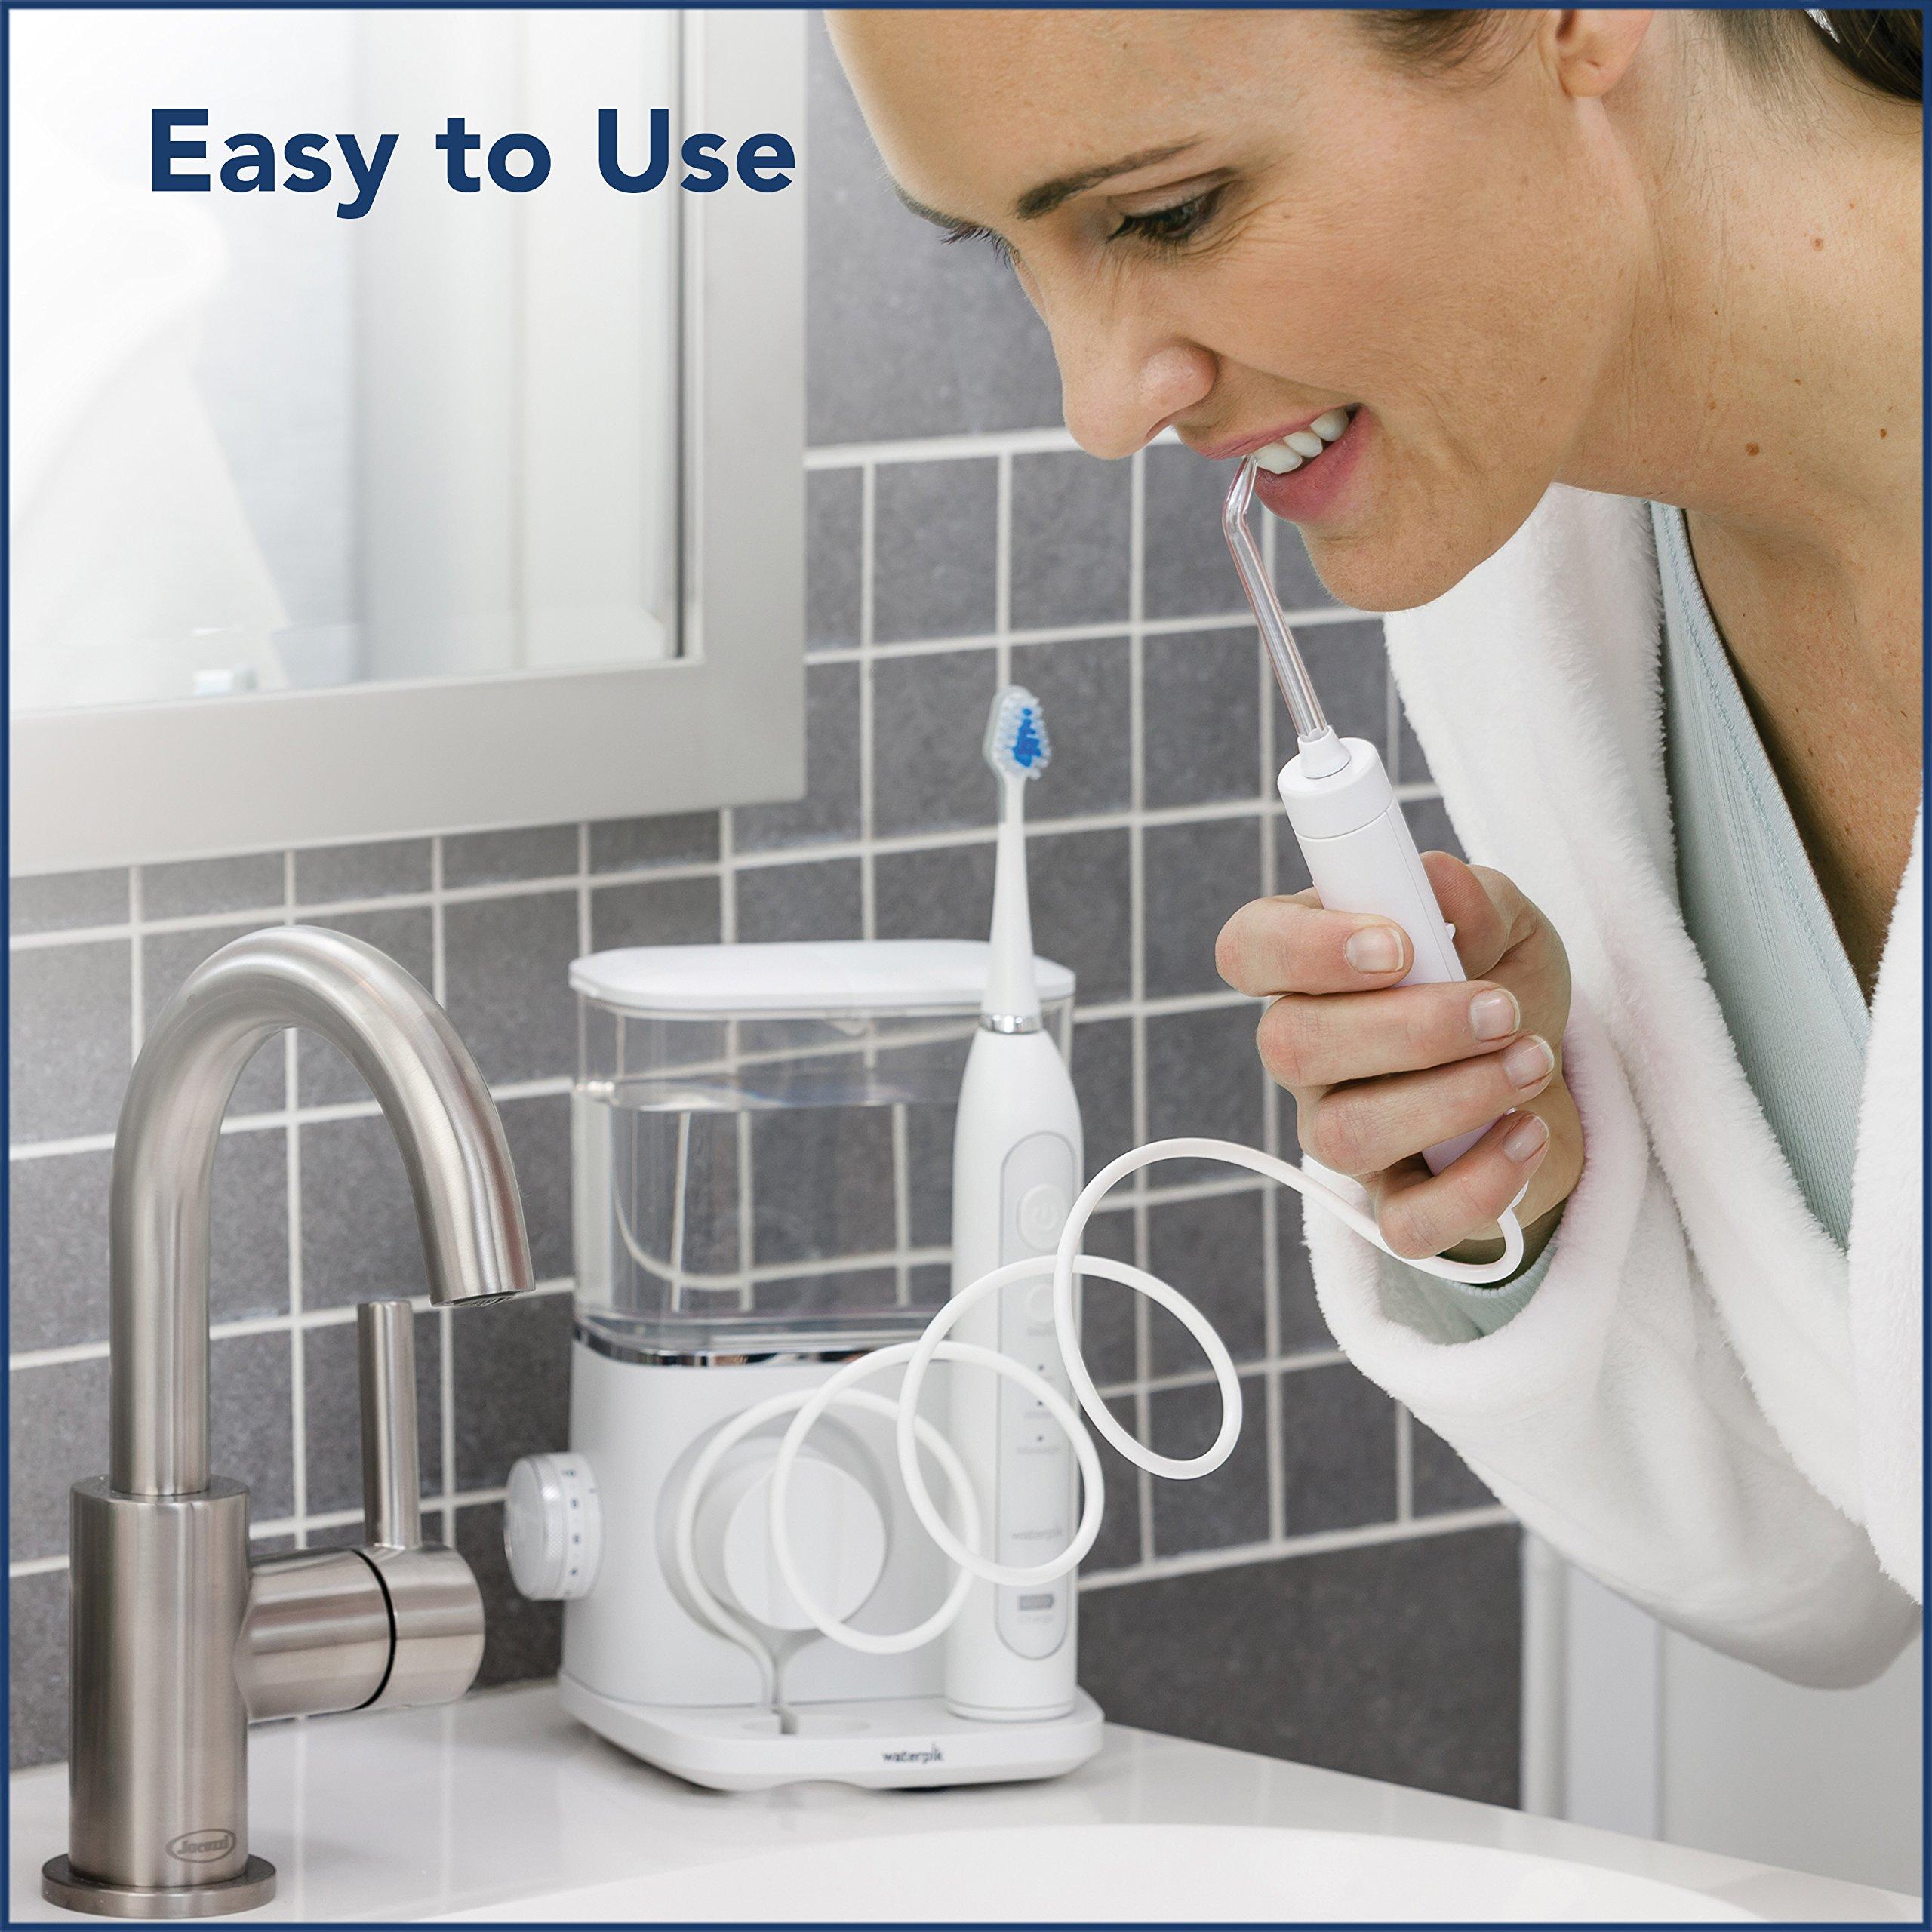 Waterpik Complete Care 9.0 Sonic Electric Toothbrush + Water Flosser, White by Waterpik (Image #2)